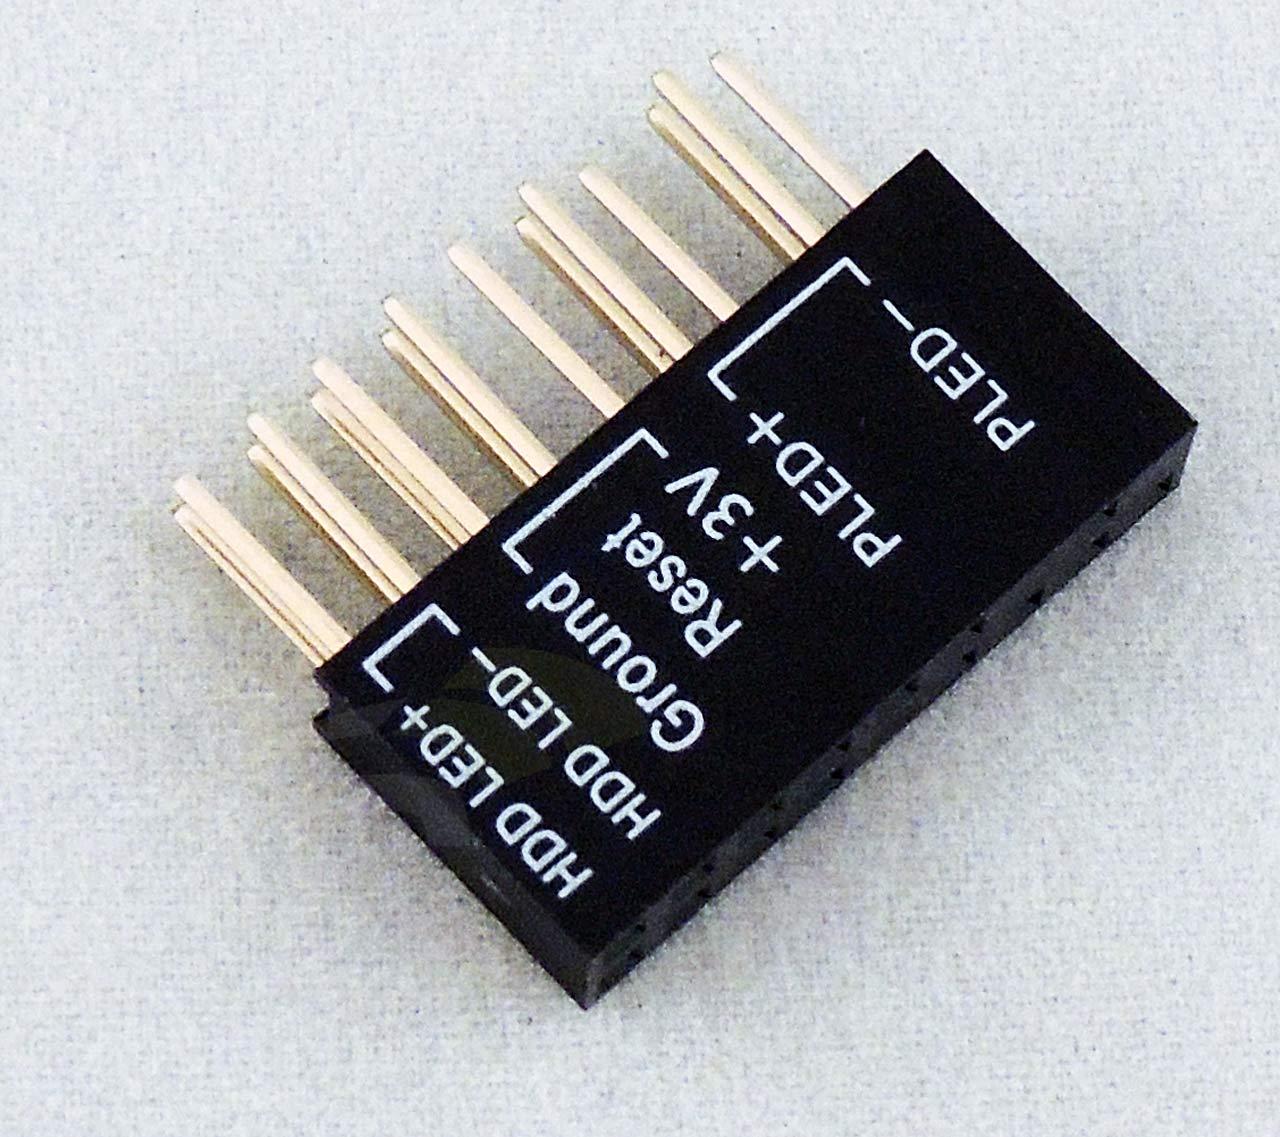 18-qconnector.jpg